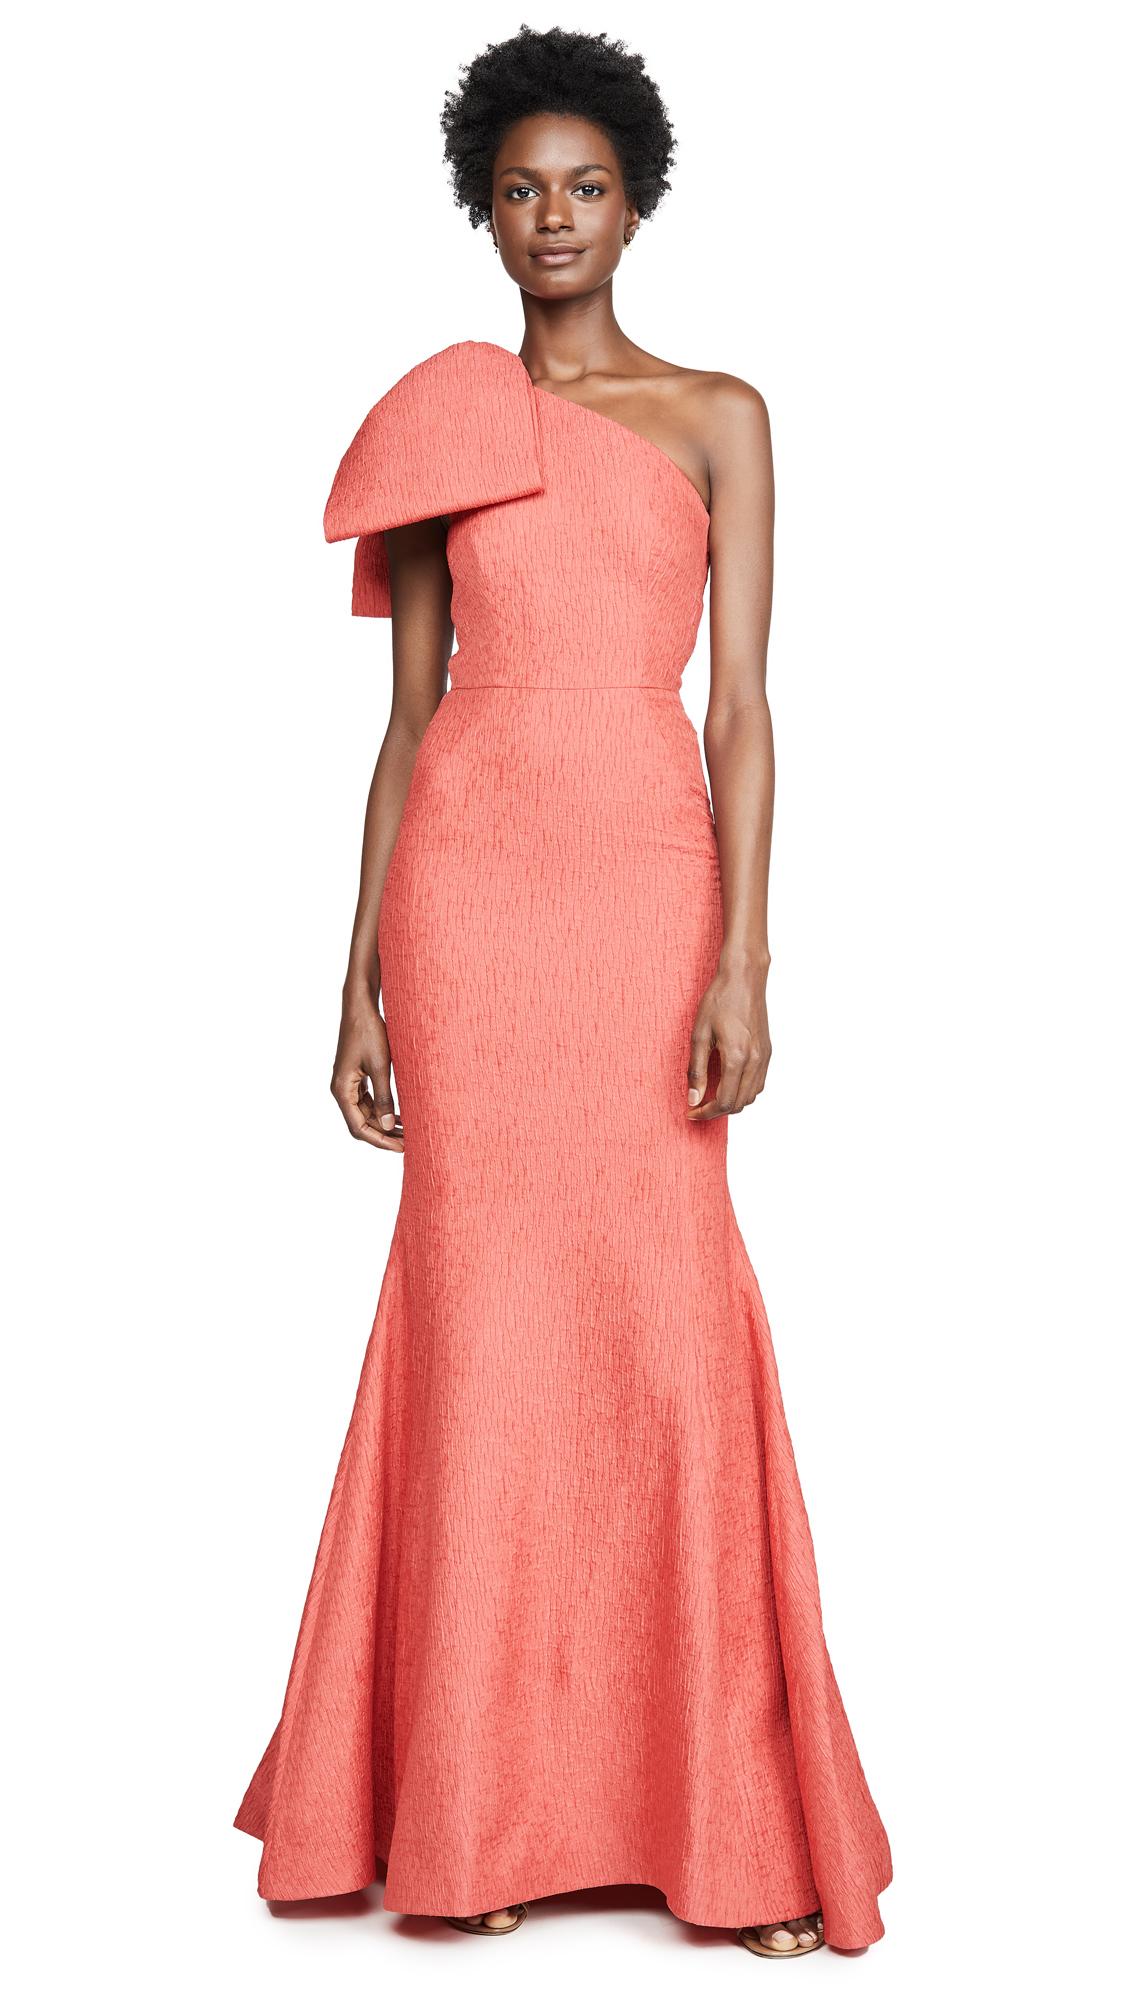 Rebecca Vallance Francesca Gown - 70% Off Sale